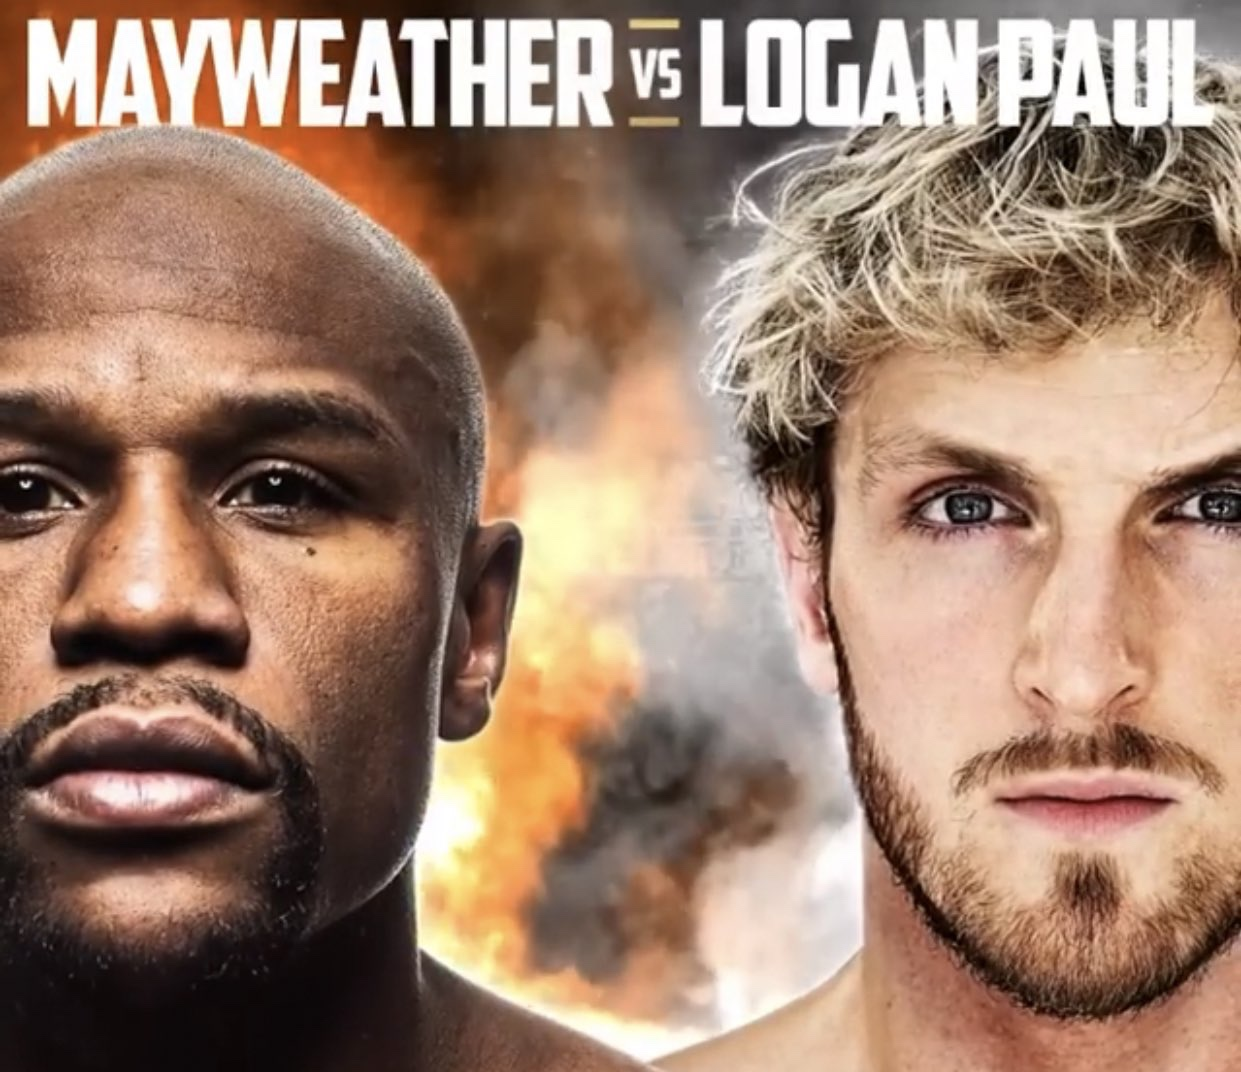 Logan Paul Vs Floyd Mayweather, But Why?